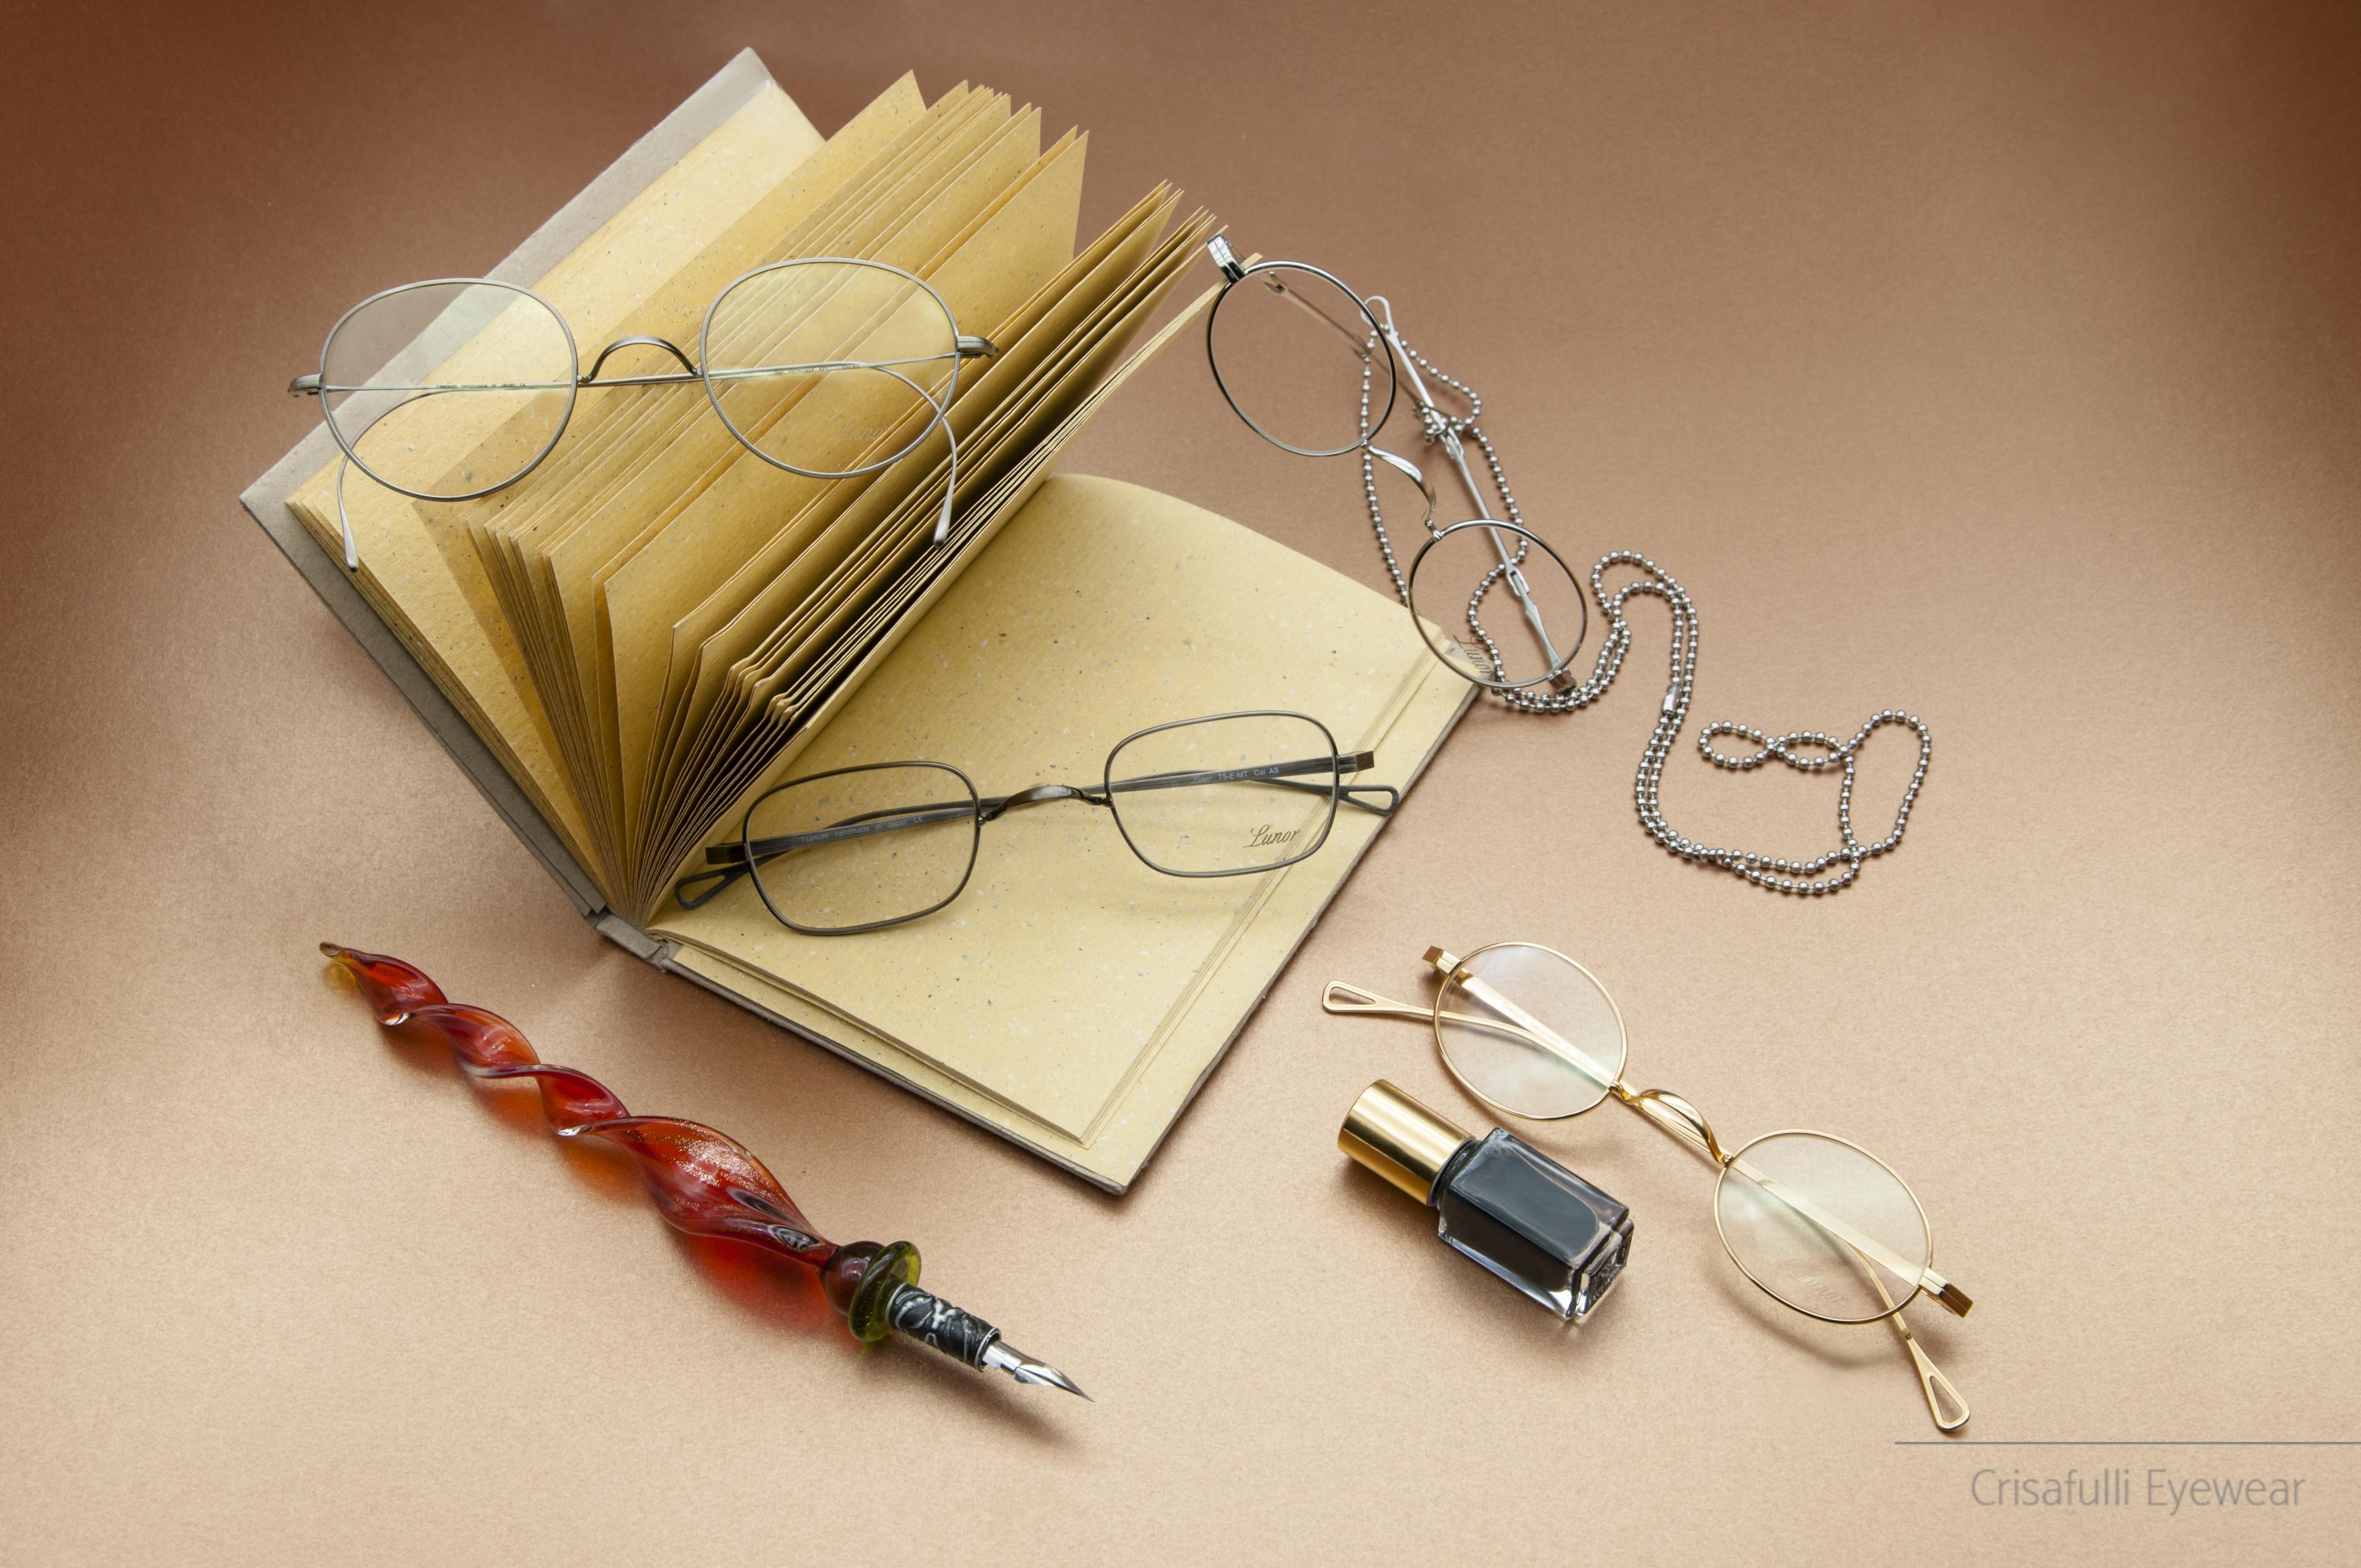 Crisafulli Eyewear - Lunor - Advantage 421 - I 10 - T5-E-MT - T1-E-MT